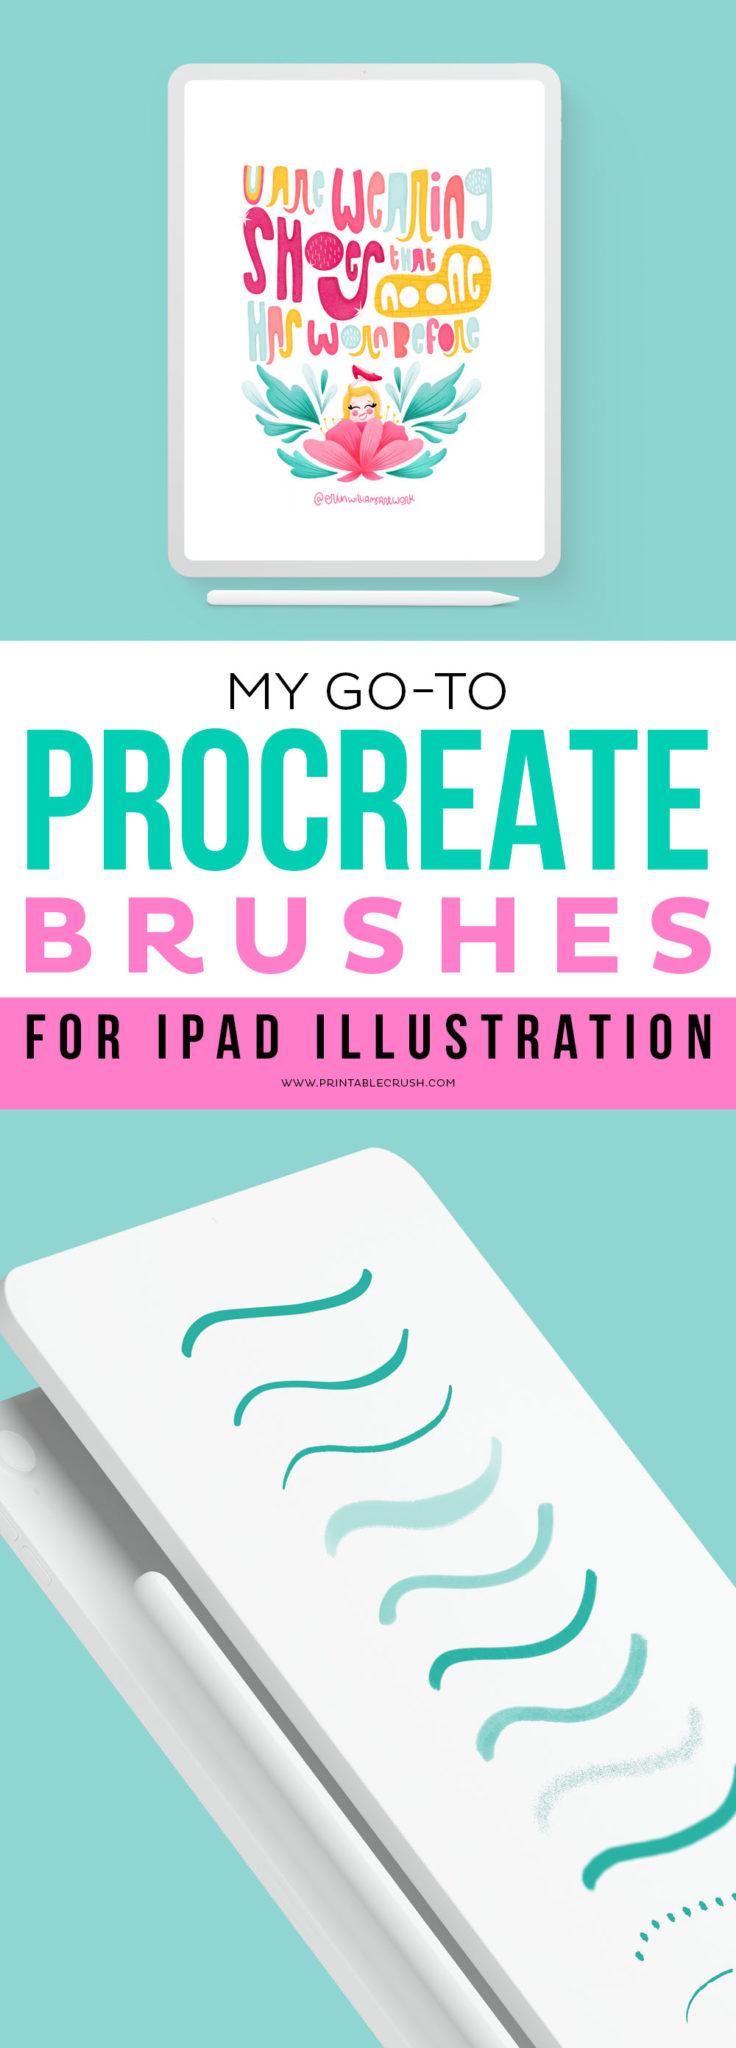 Top Procreate Brushes for iPad Illustration